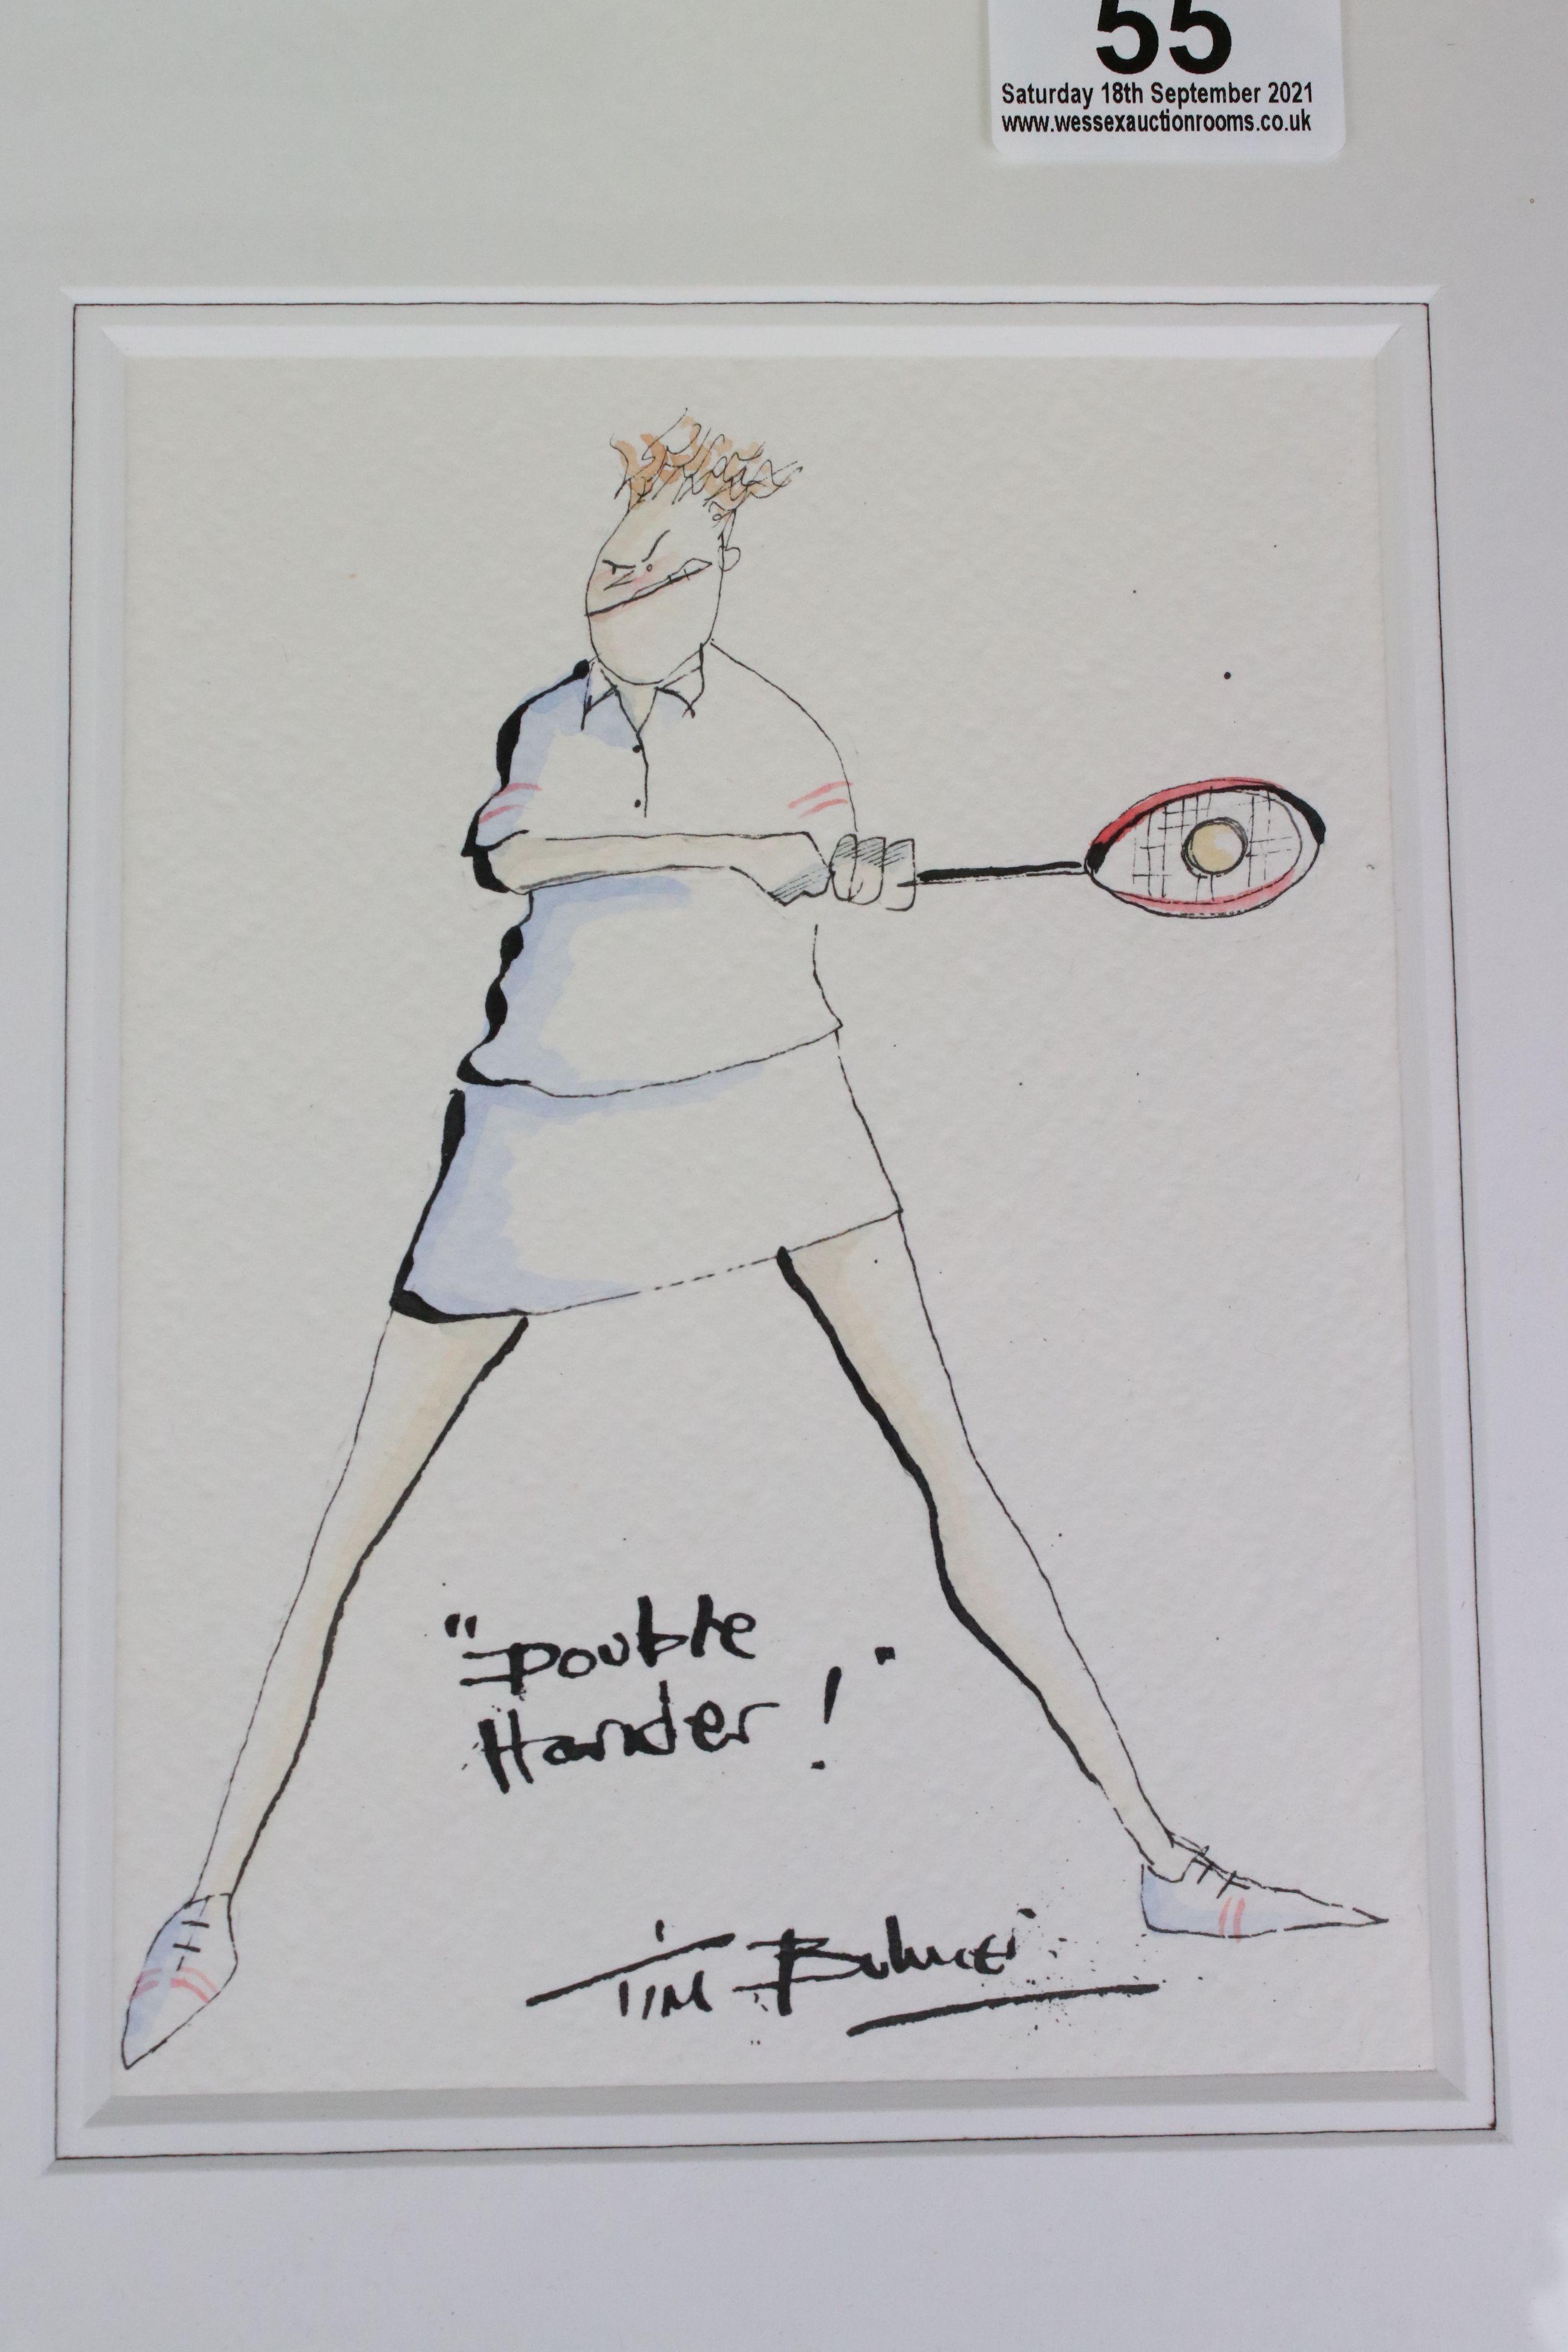 Tim Bulmer (cartoonist) a pair of humorous tennis watercolour cartoons & a signed Angela Fielder - Image 6 of 7